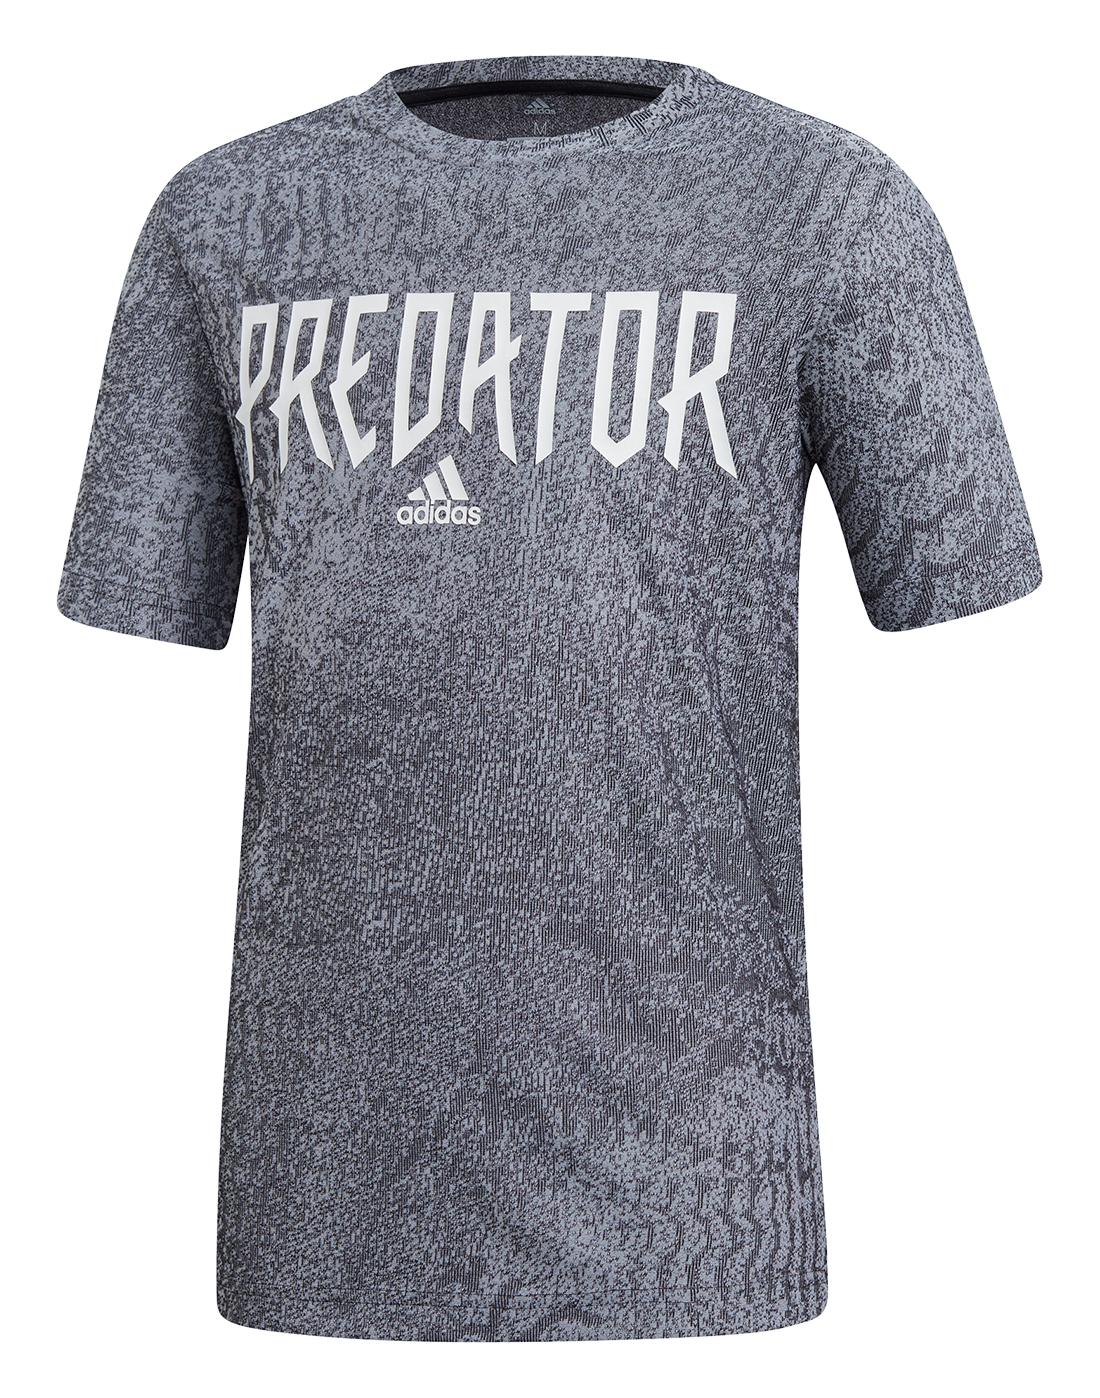 Kid's Grey adidas Predator T-Shirt